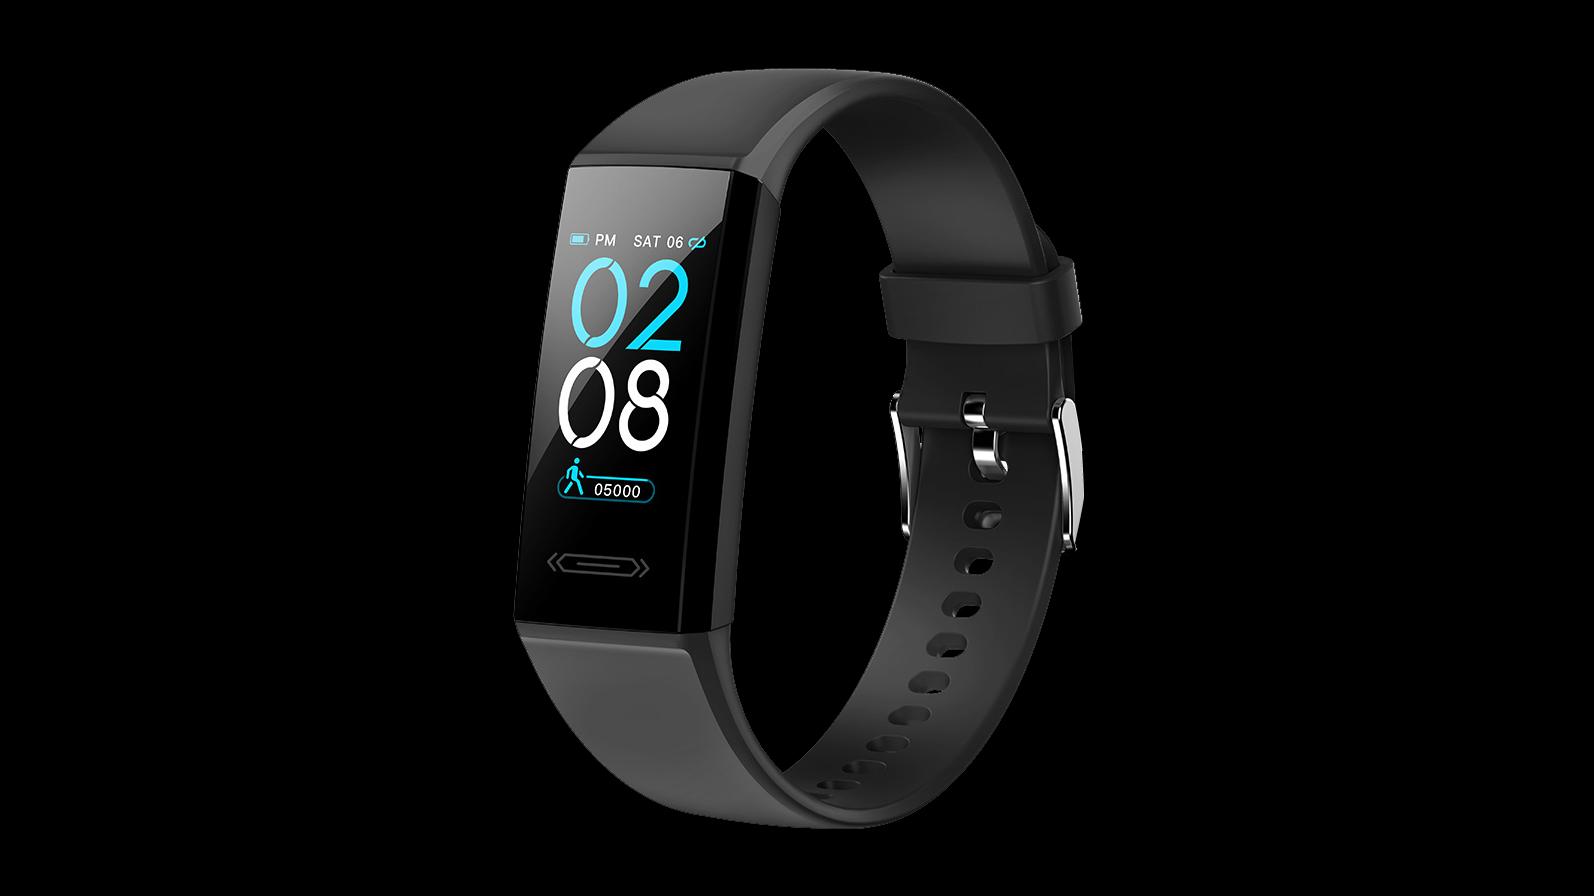 Ciało Temperatura Inteligentna Bransoletka Tętna Smart Band Fitness Tracker Smart Watch Band Inteligentny Nadgarstek V100S